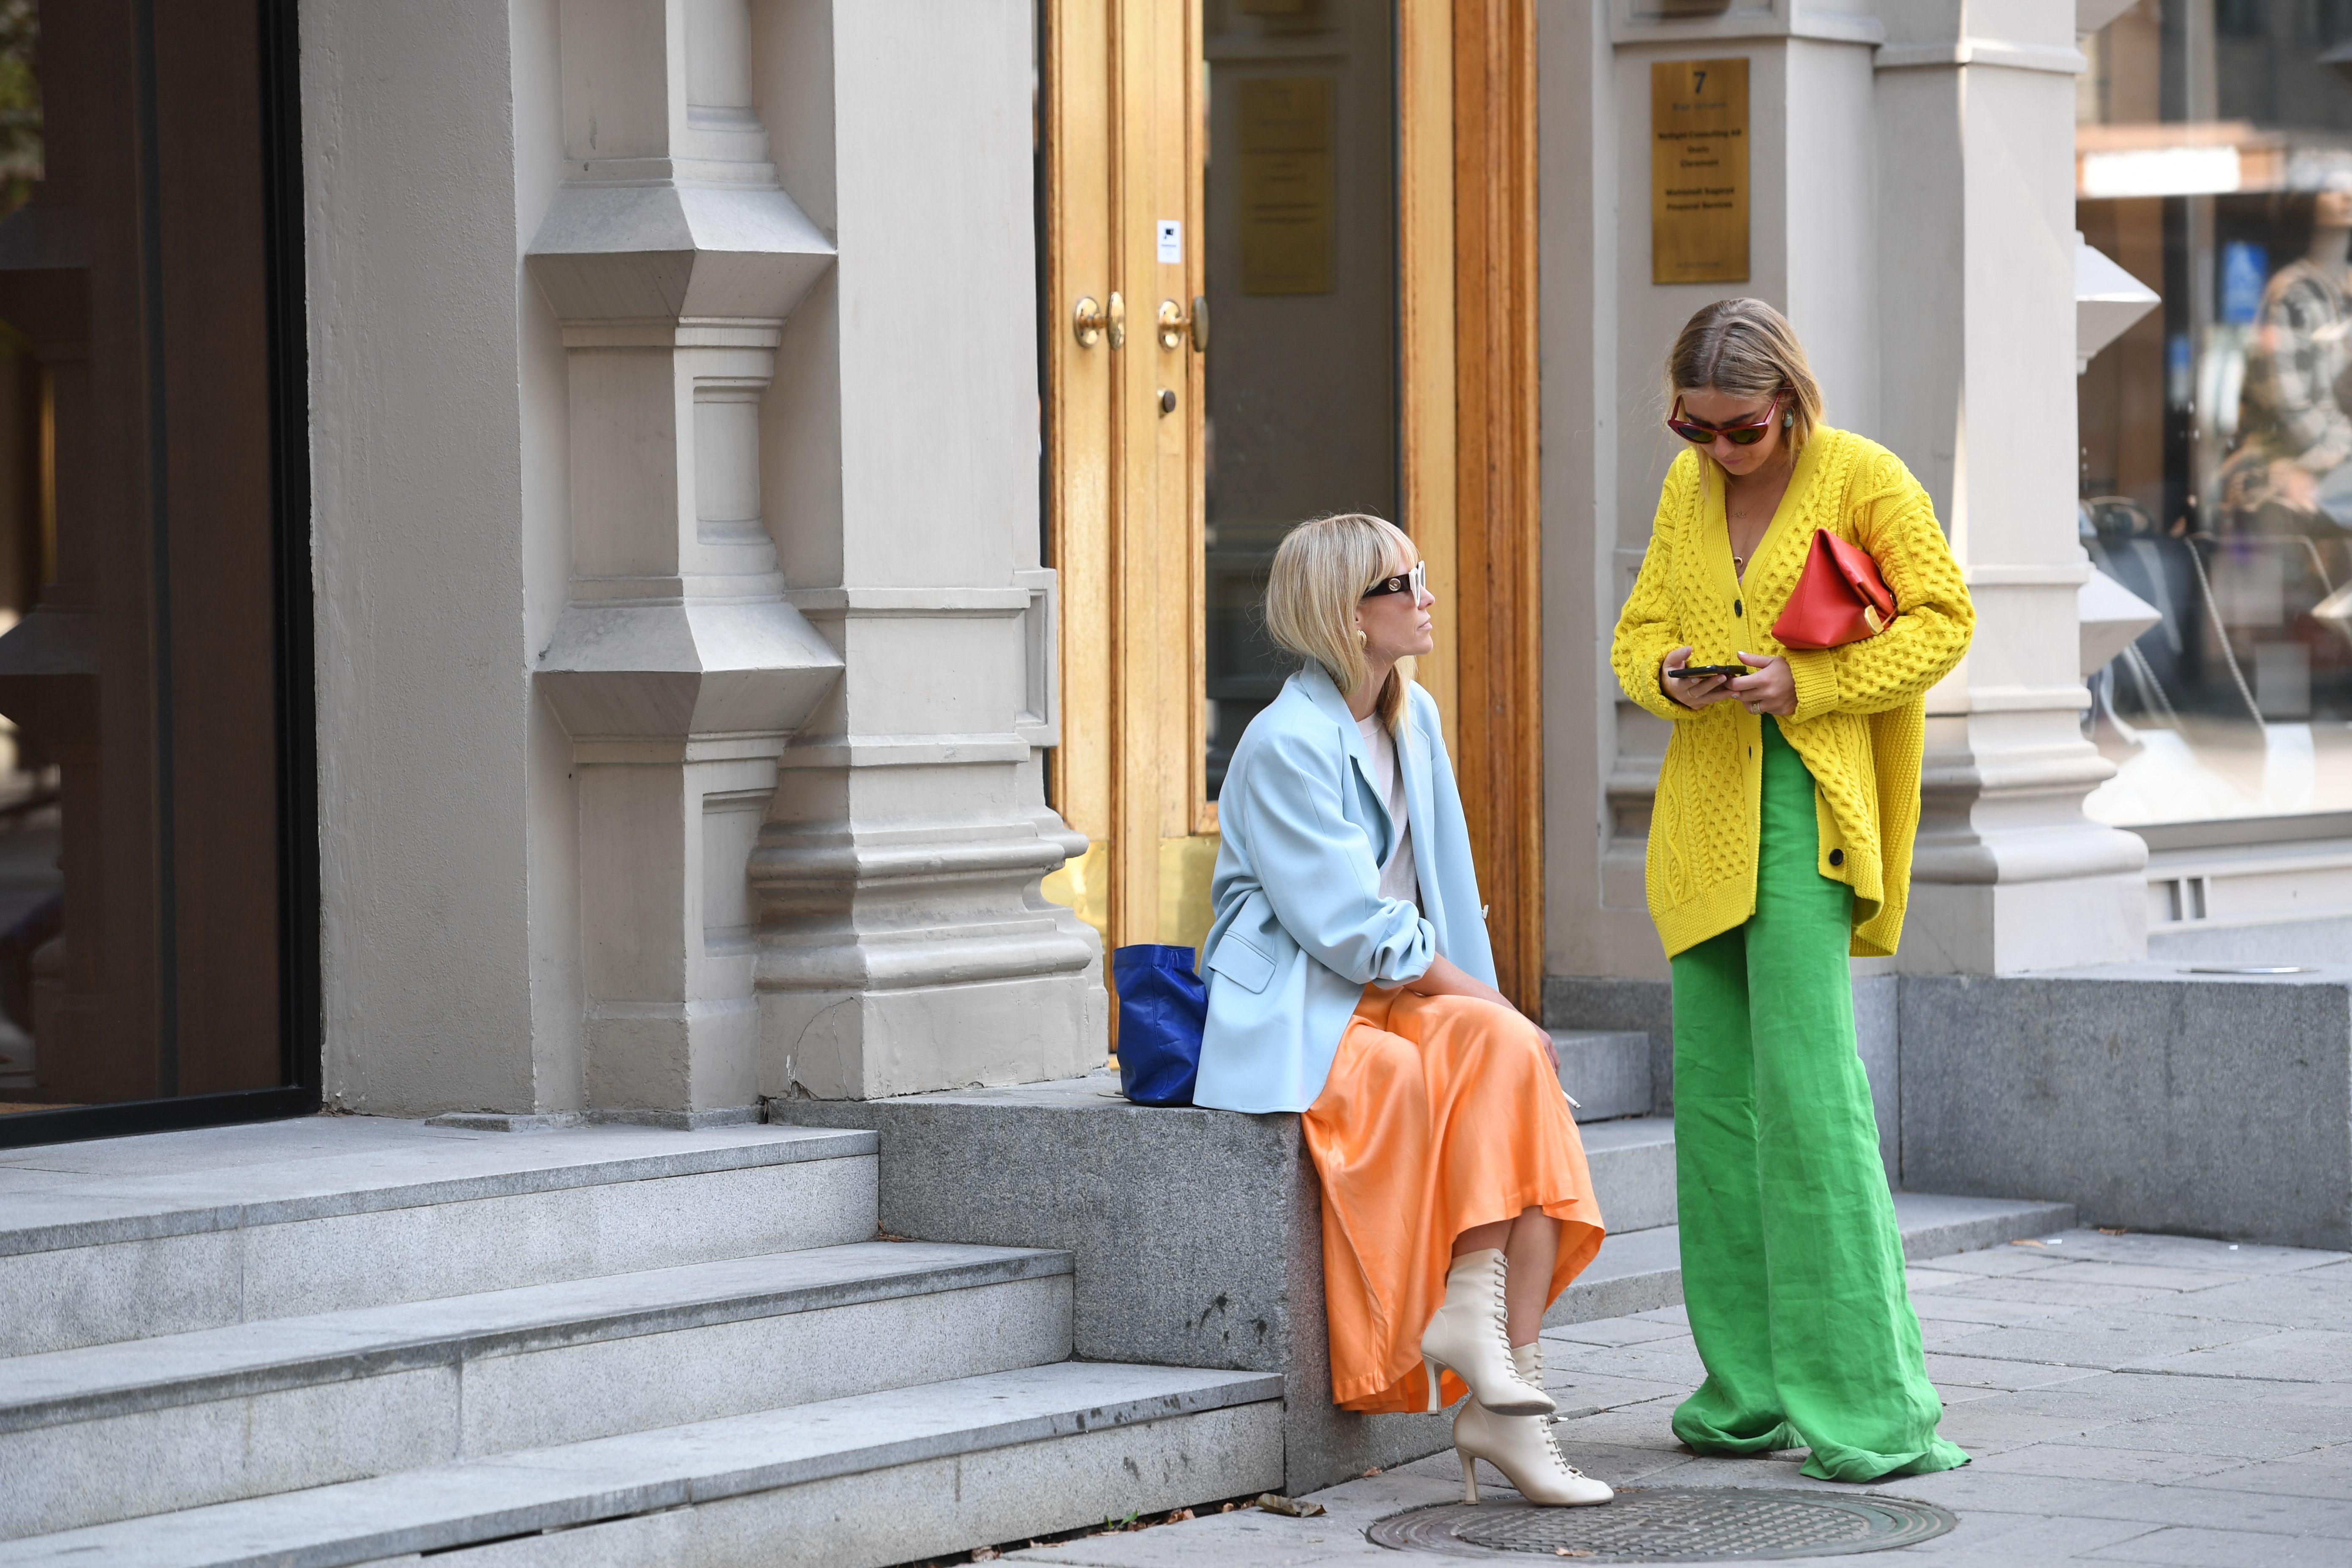 Street StyleStreet style, Spring Summer 2019, Stockholm Fashion Week, Sweden - 28 Aug 2018